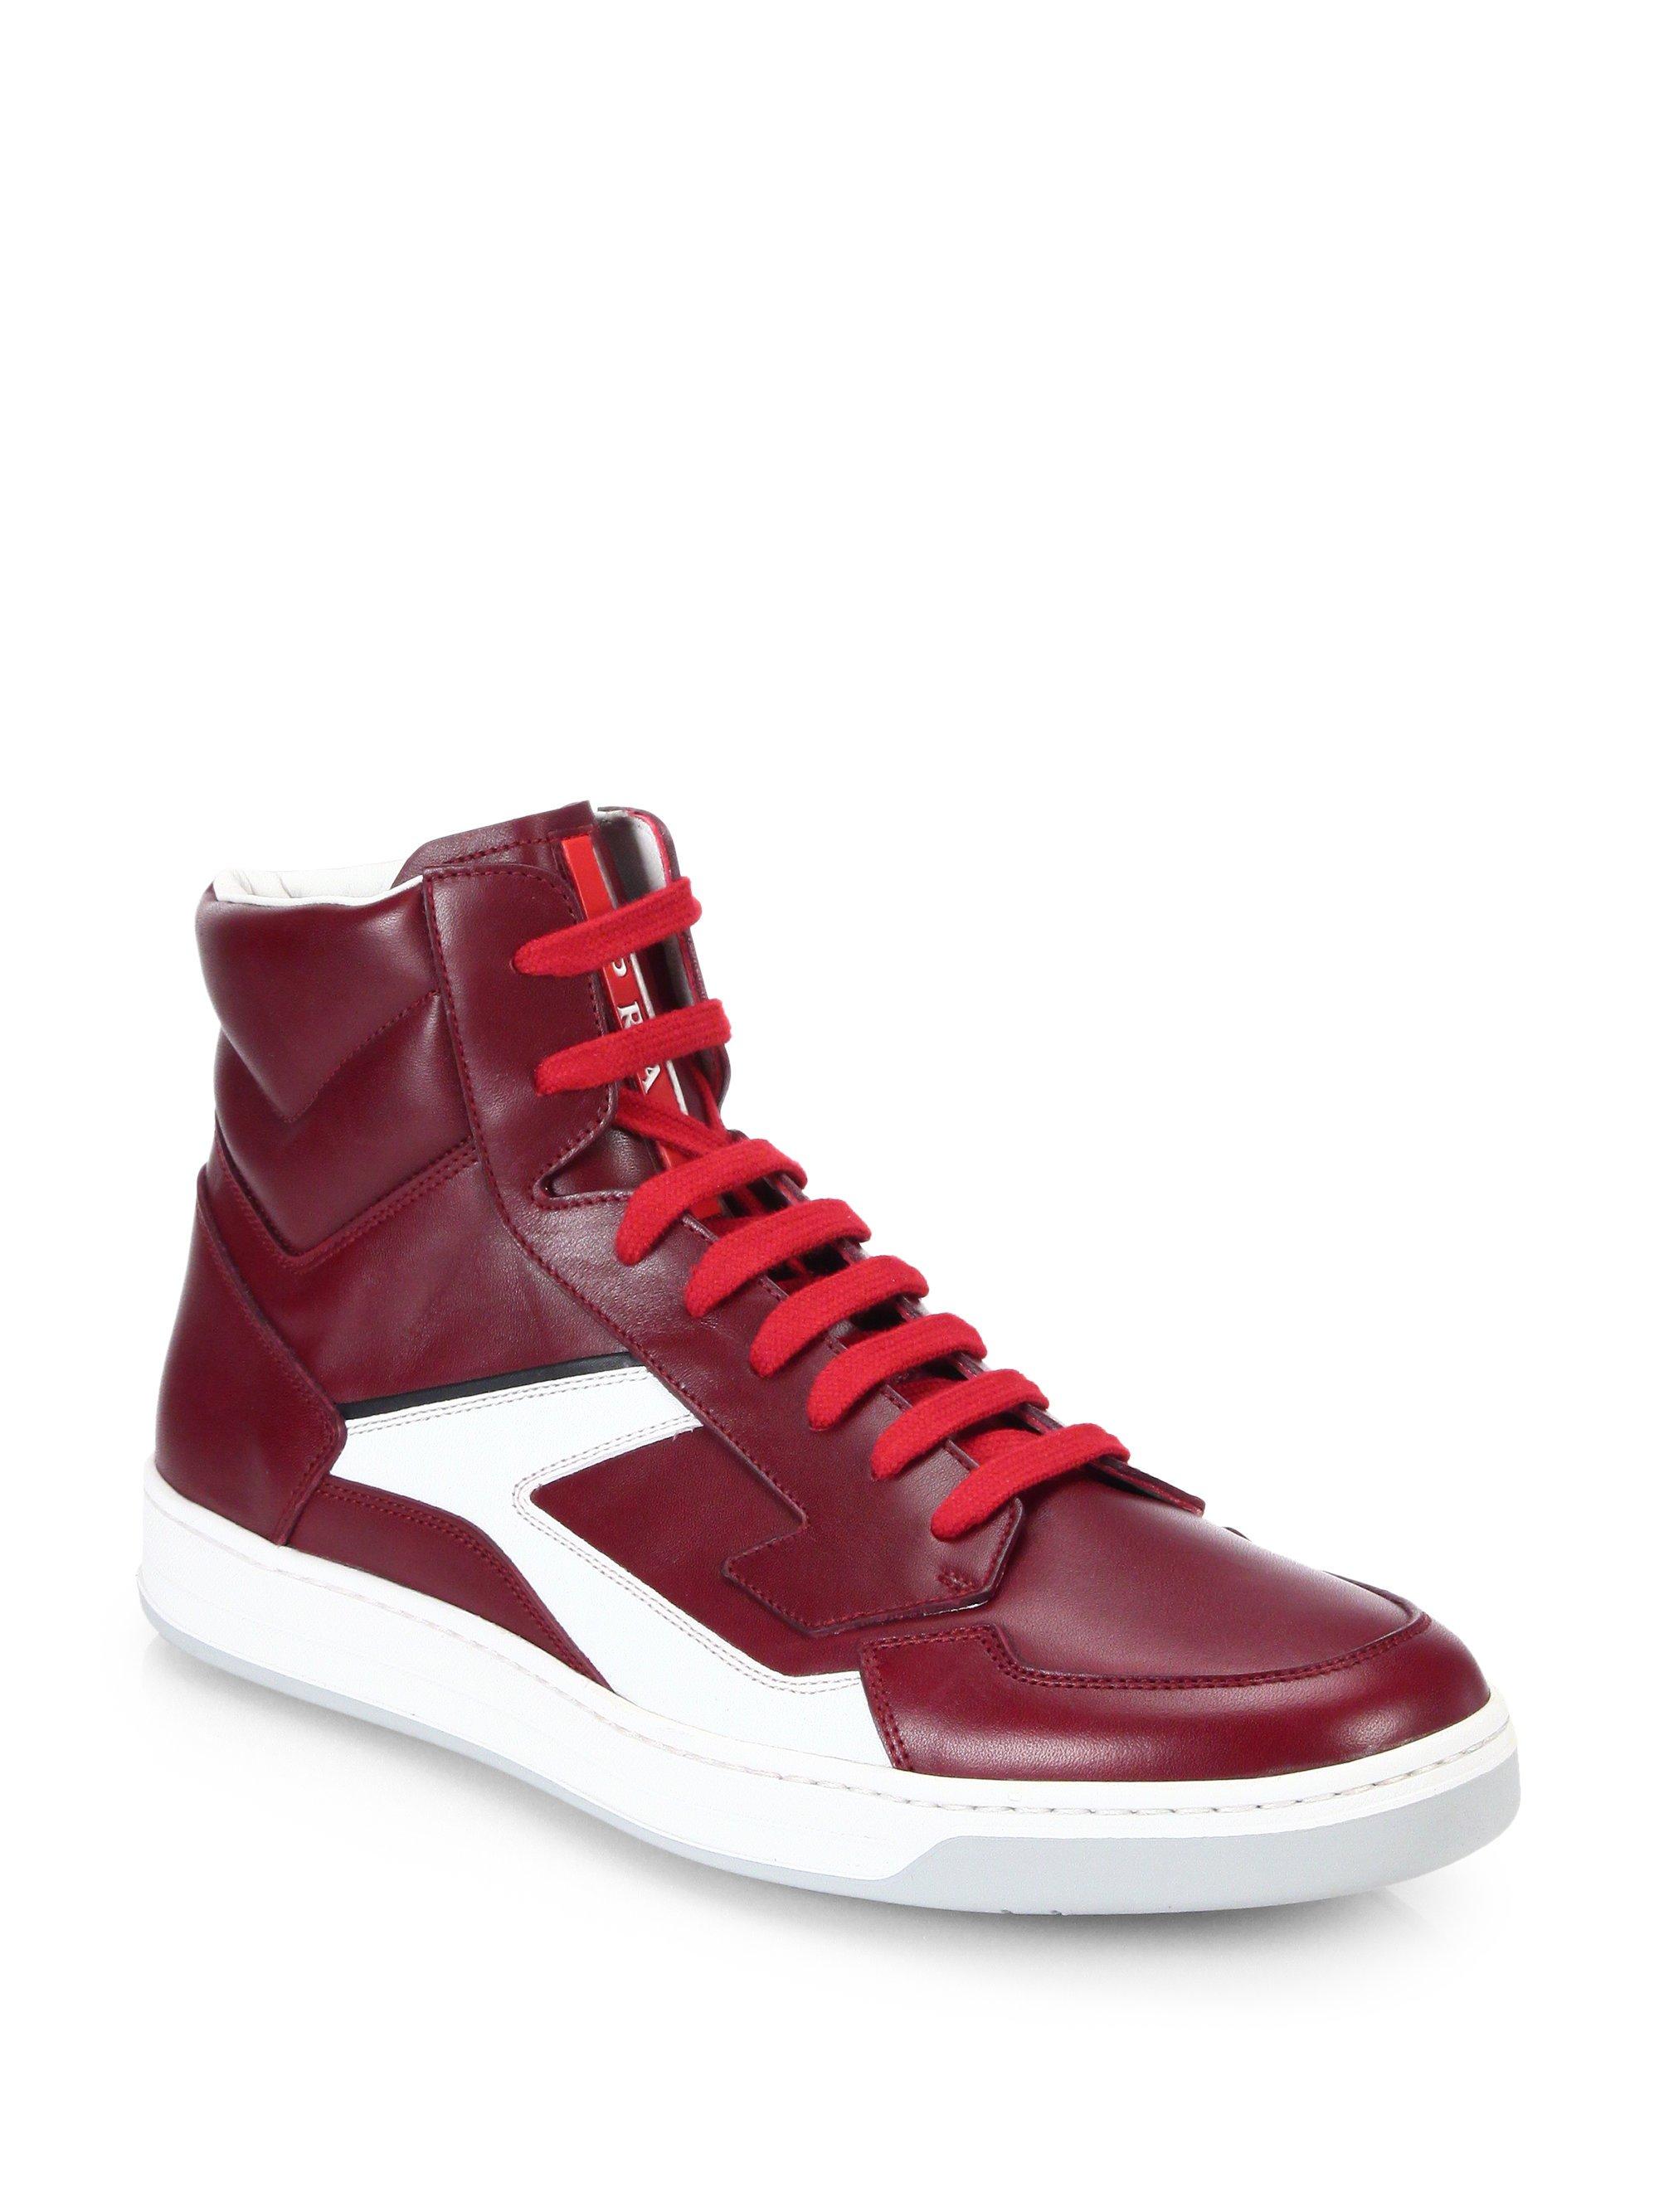 lyst prada leather hightop sneakers in red for men